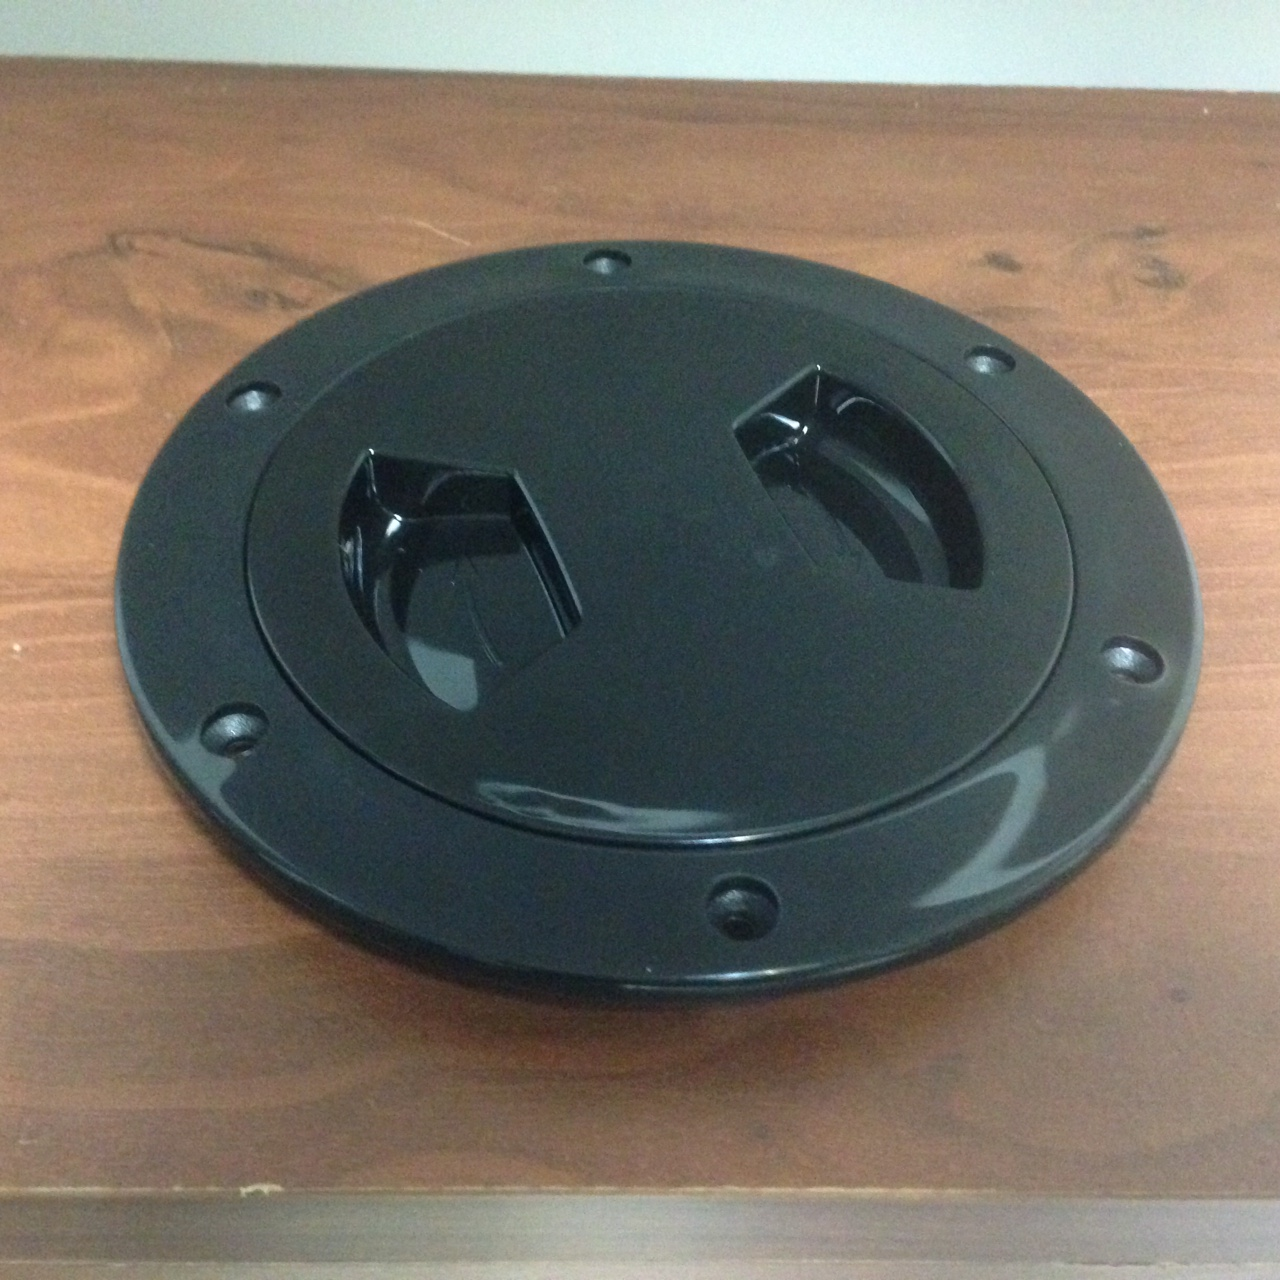 "MARINE BOAT KAYAK BLACK PLASTIC DECK PLATE 6/""D WATERPROOF INSPECTION BAYONET"